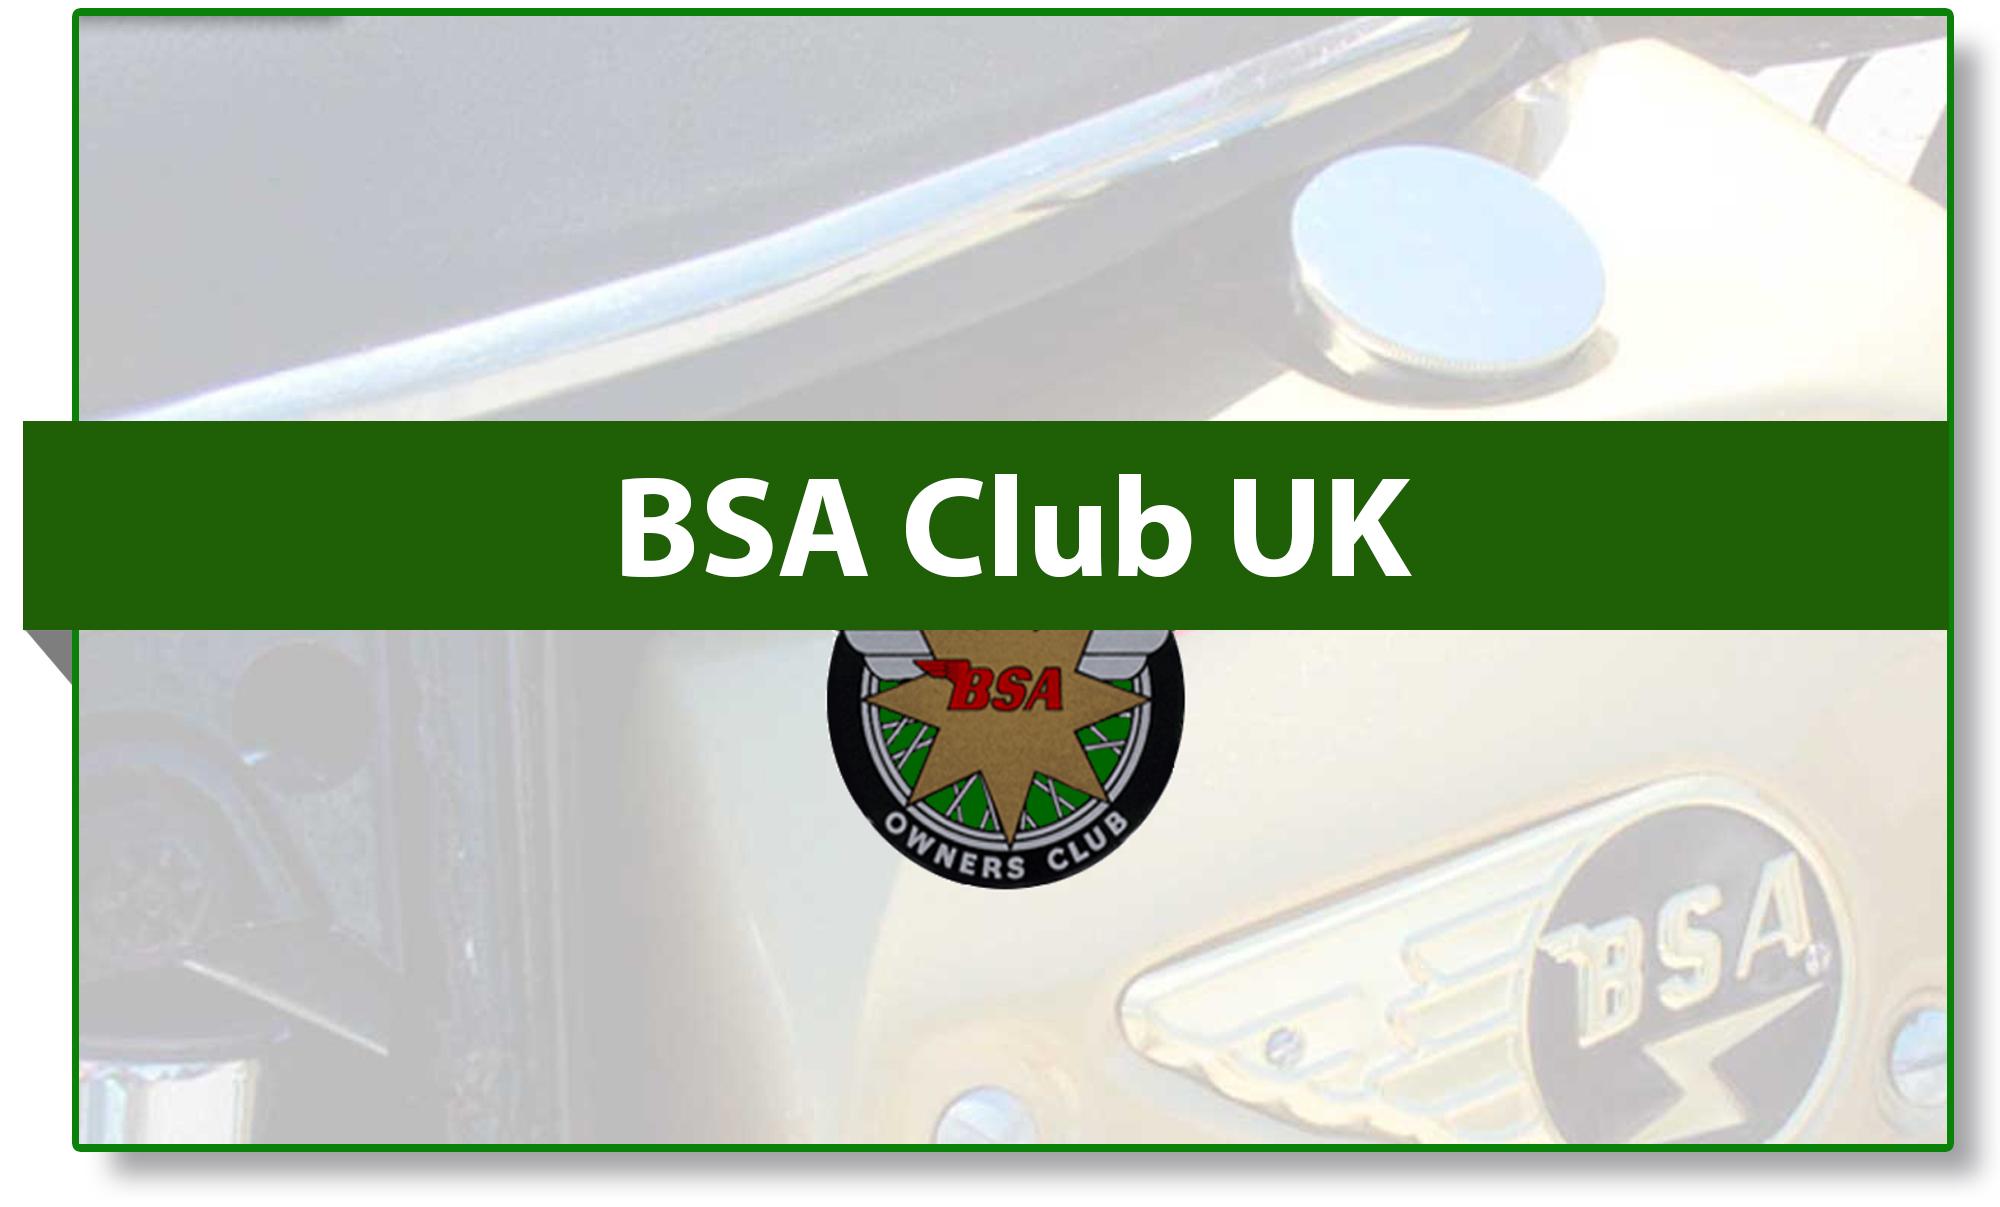 BSA club UK